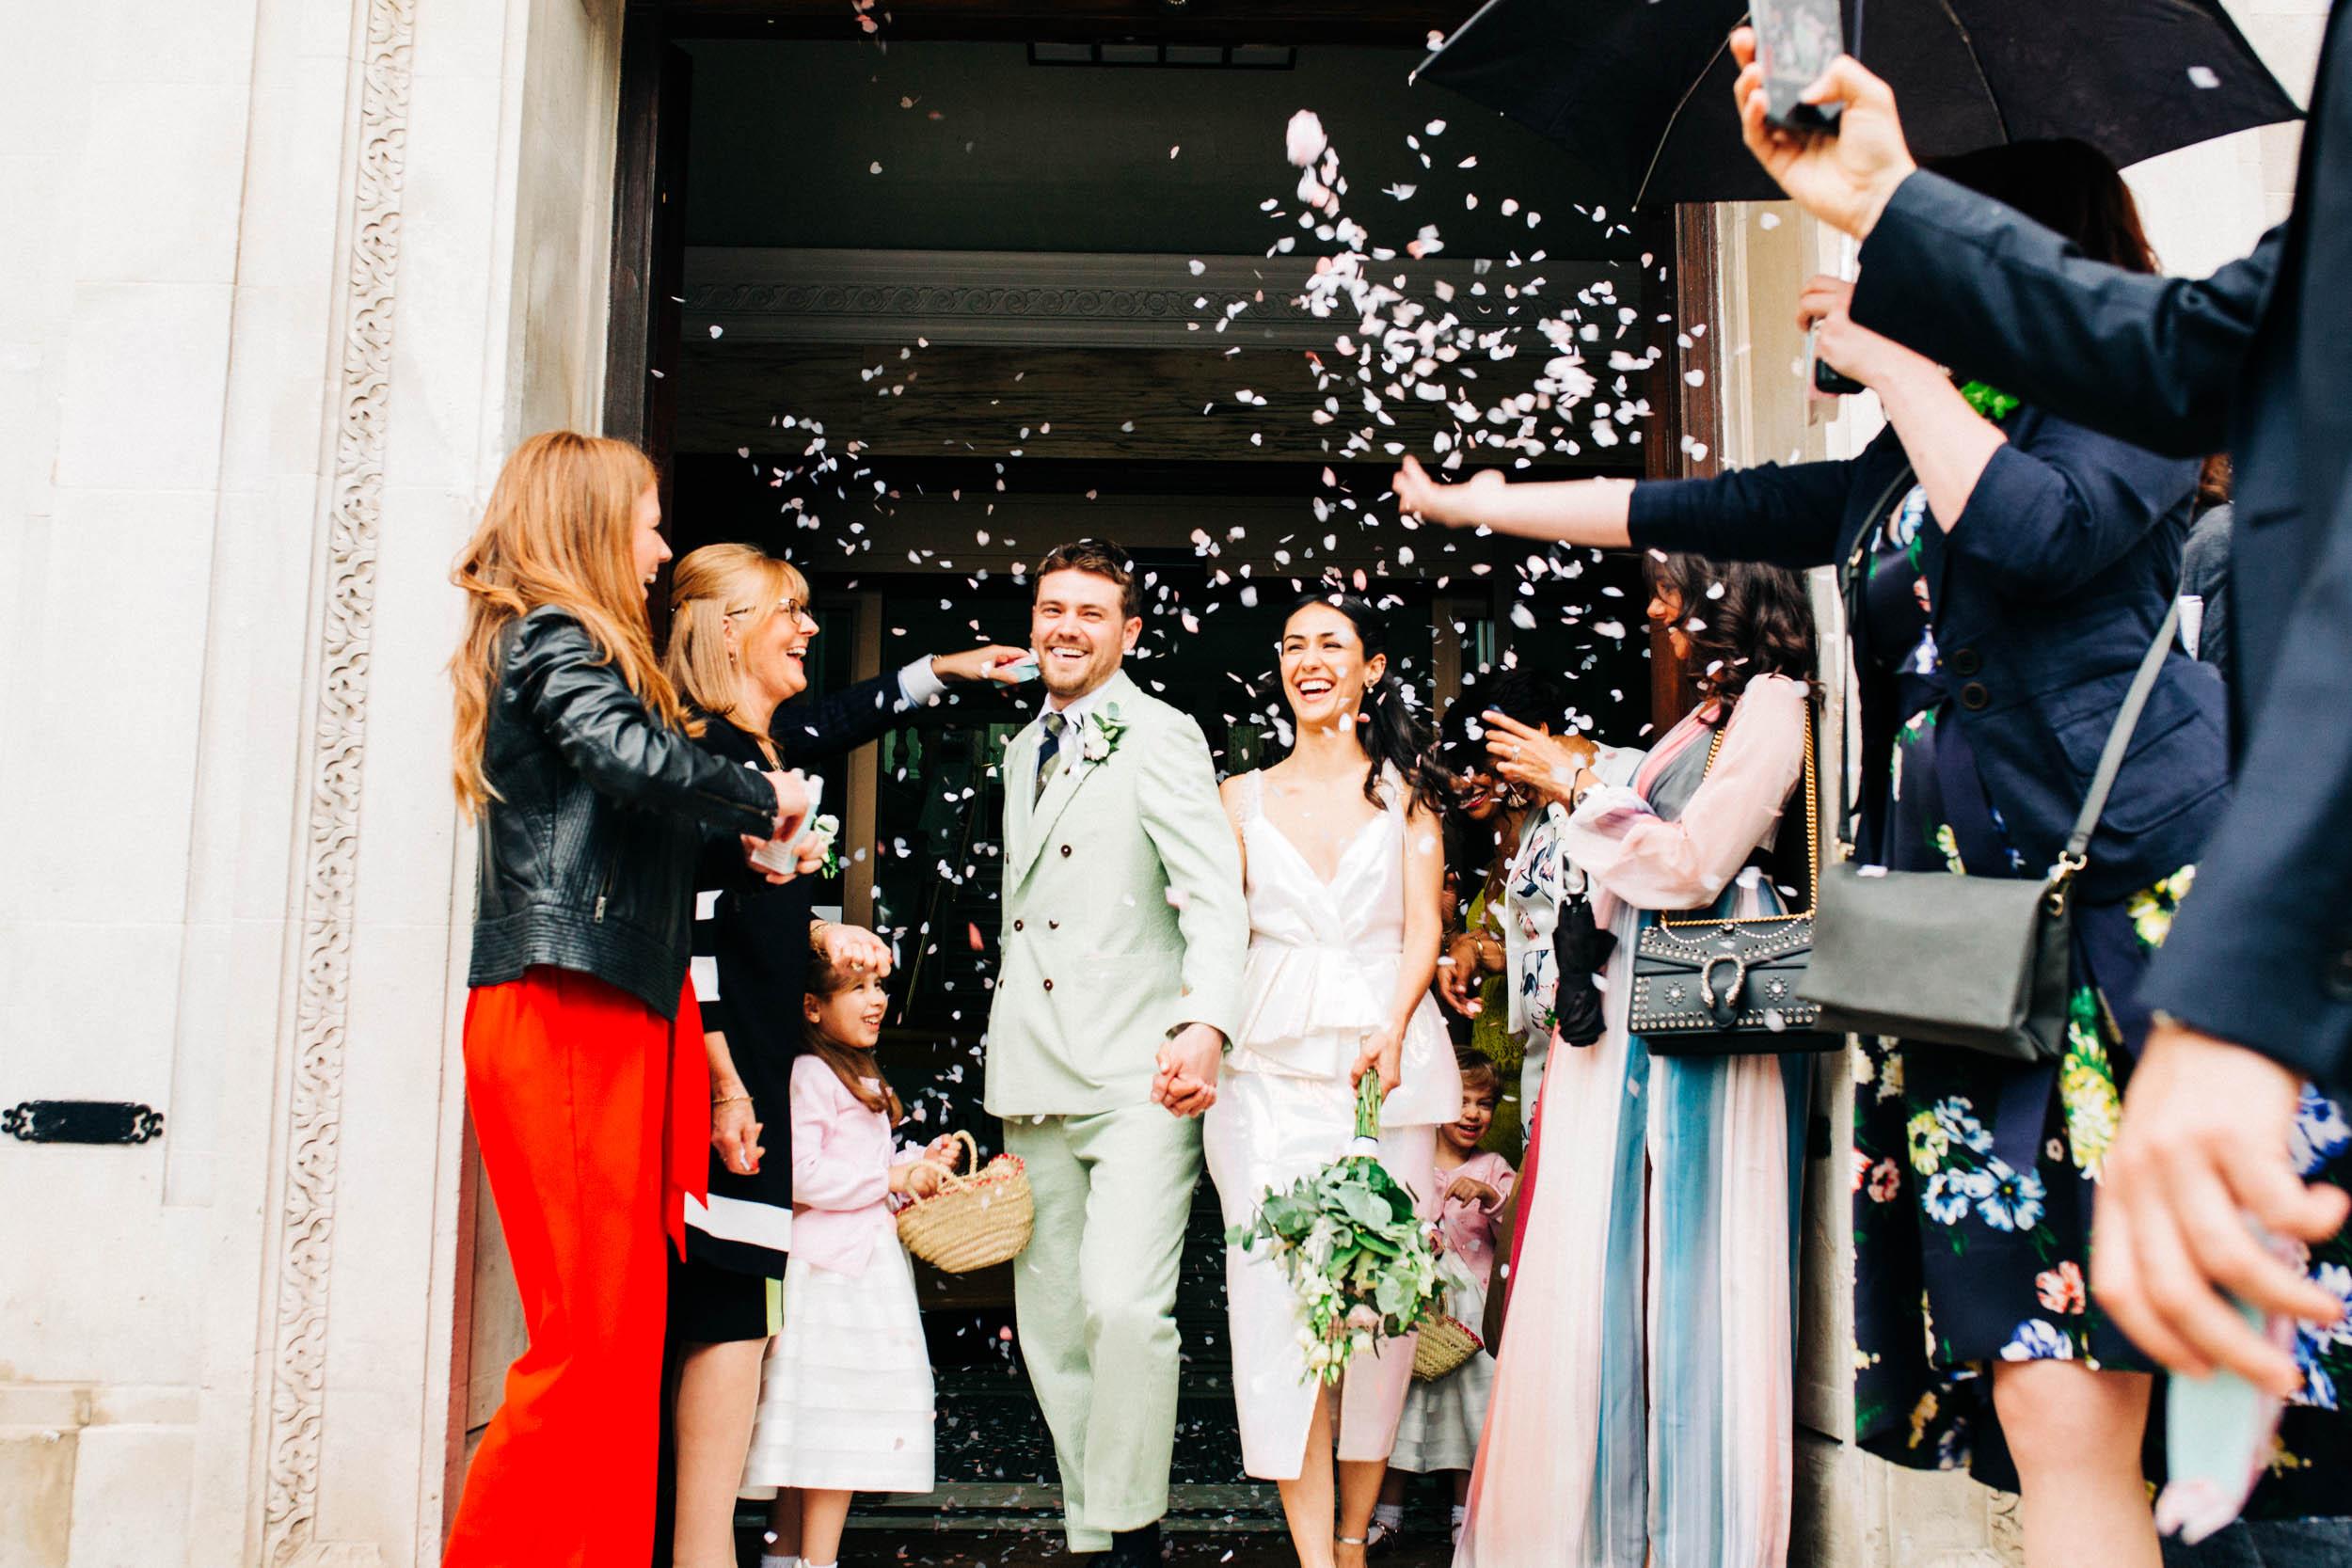 Alex_Sedgmond_Photography-SouthWalesWeddingPhotography-Wedding-Photographer-Cardiff-93.jpg